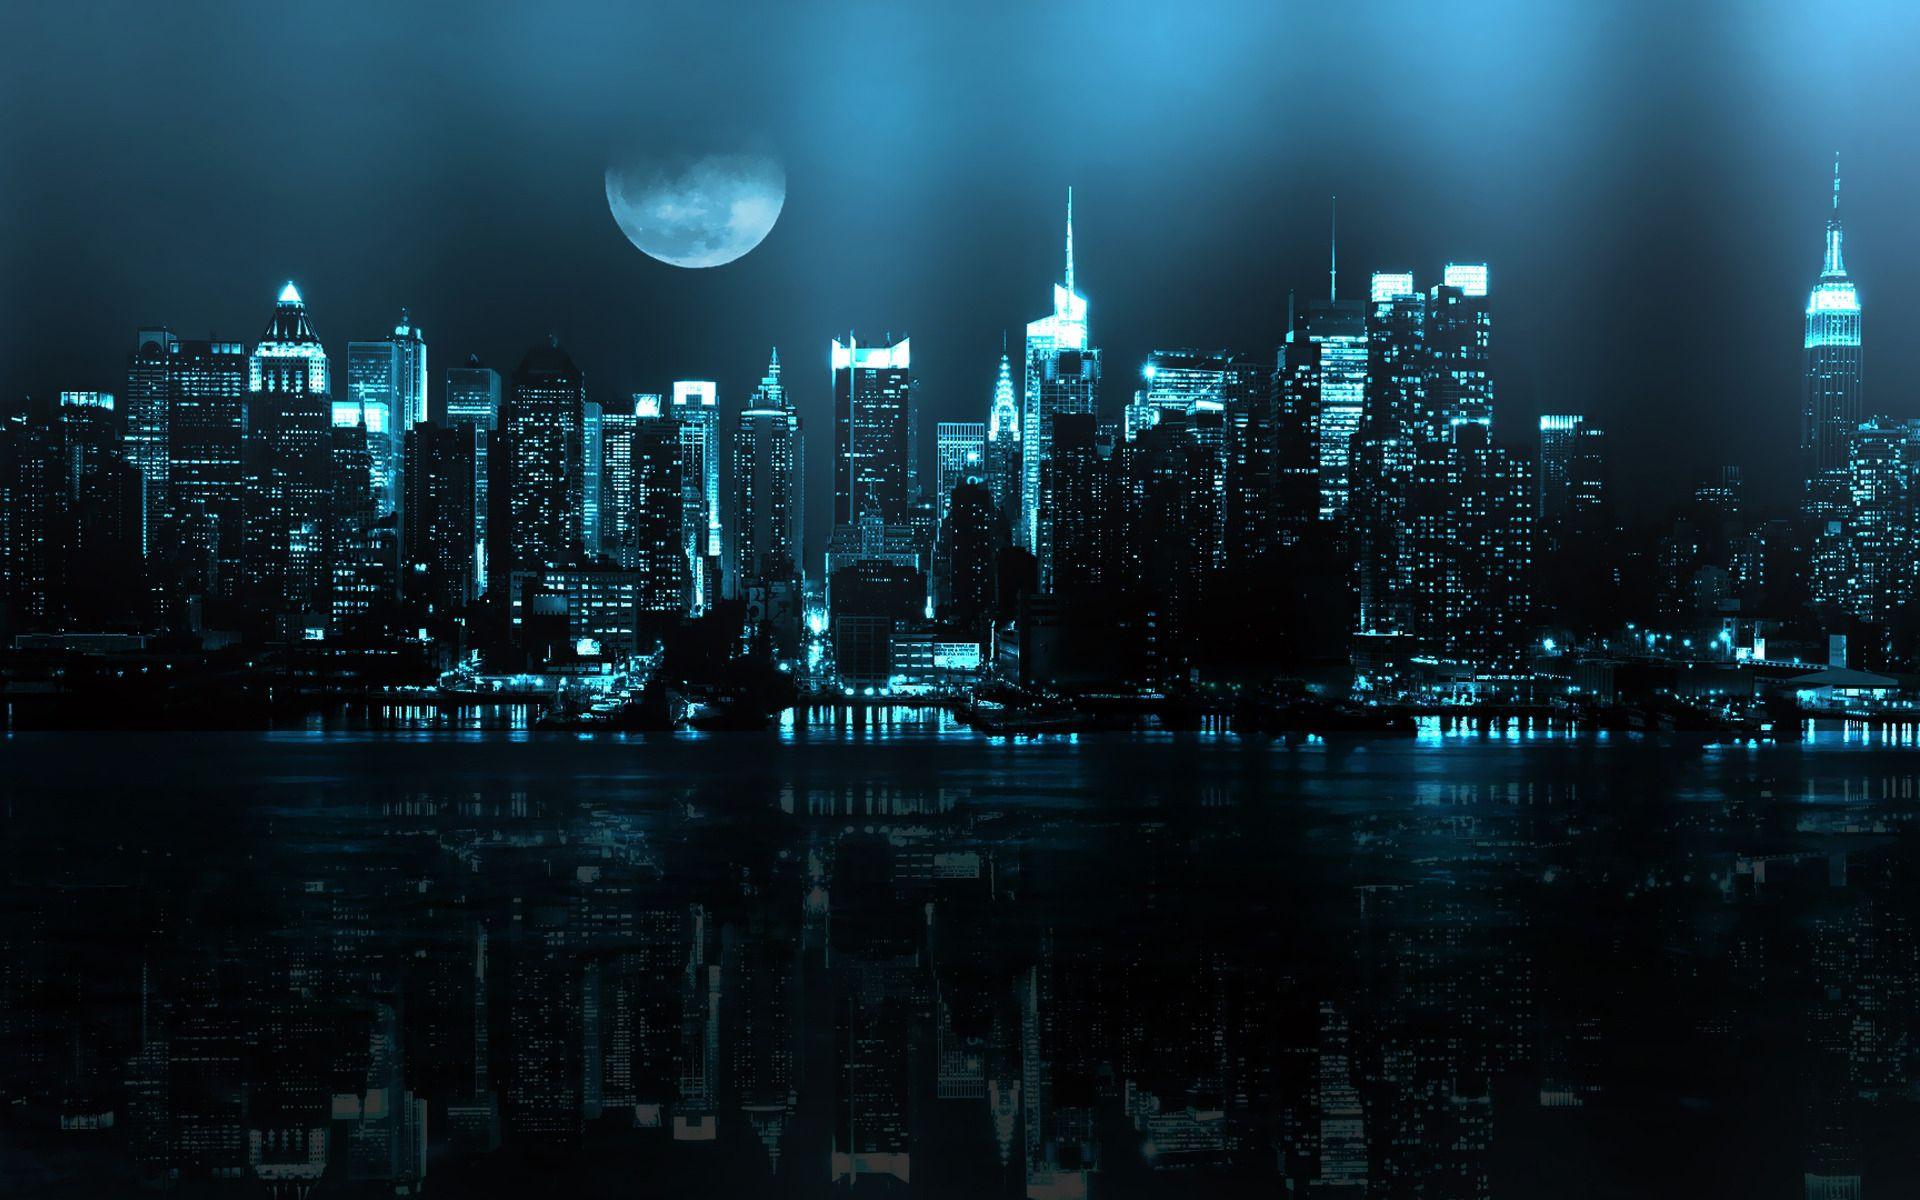 Dark Newyork City Wallpaper Hd Wallpapers 1080p Download Full Hd Wallpaper Download Www Free Hd Cityscape Wallpaper Cool Desktop Backgrounds City Wallpaper